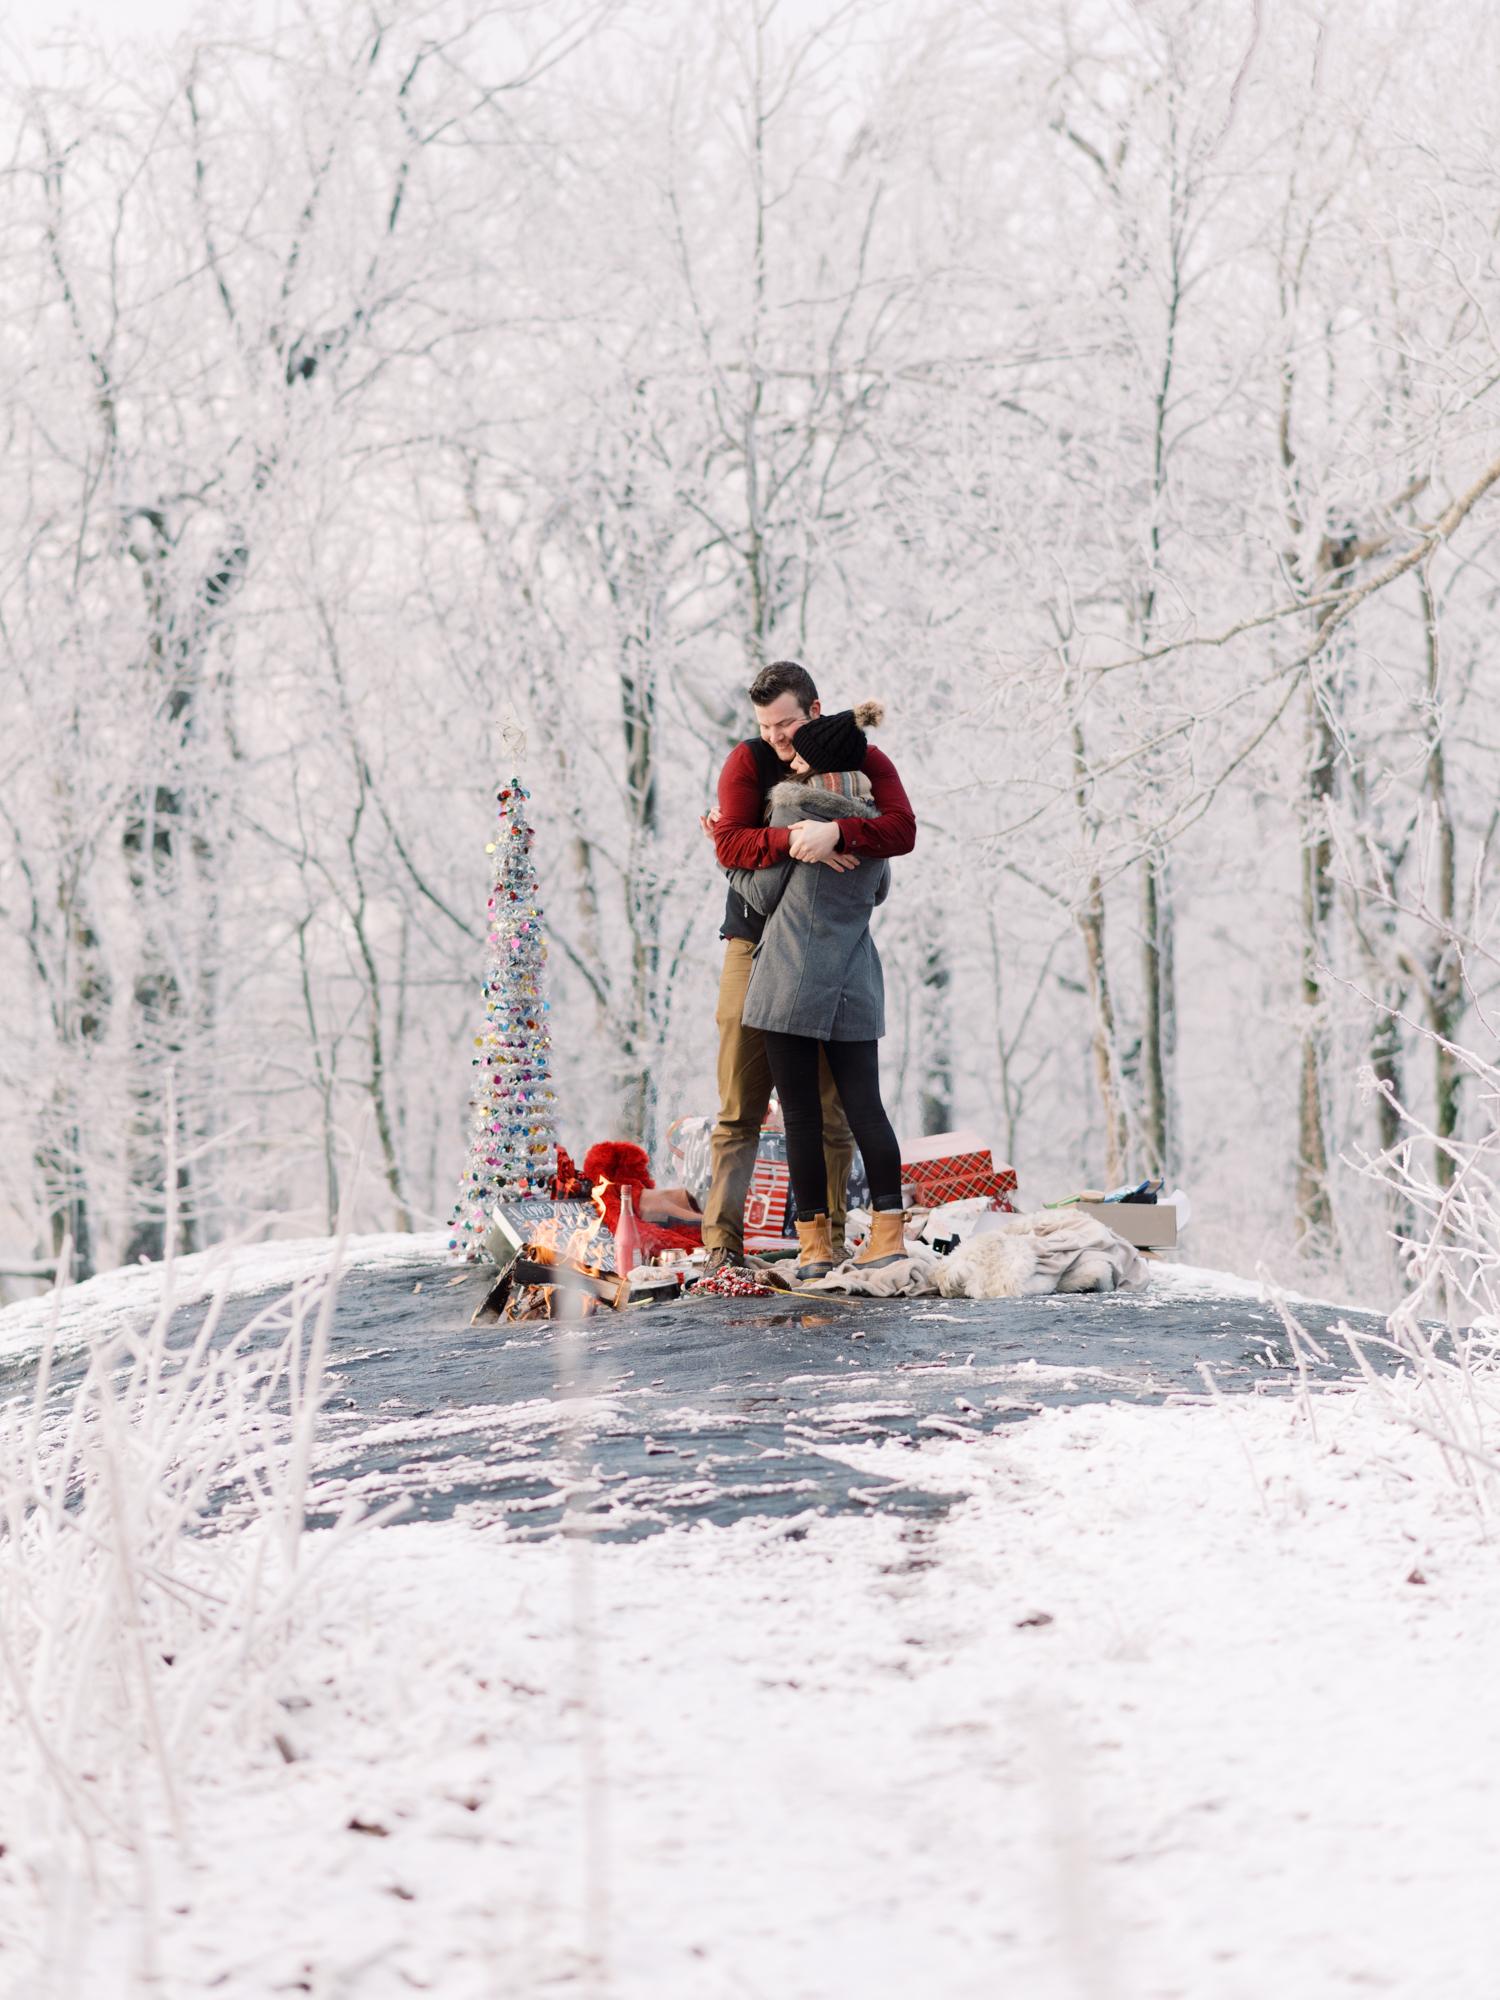 snowy-georgia-proposal-preachers-rock-atlanta-dahlonega-wedding-photographer-hannah-forsberg-fine-art-film-16.jpg